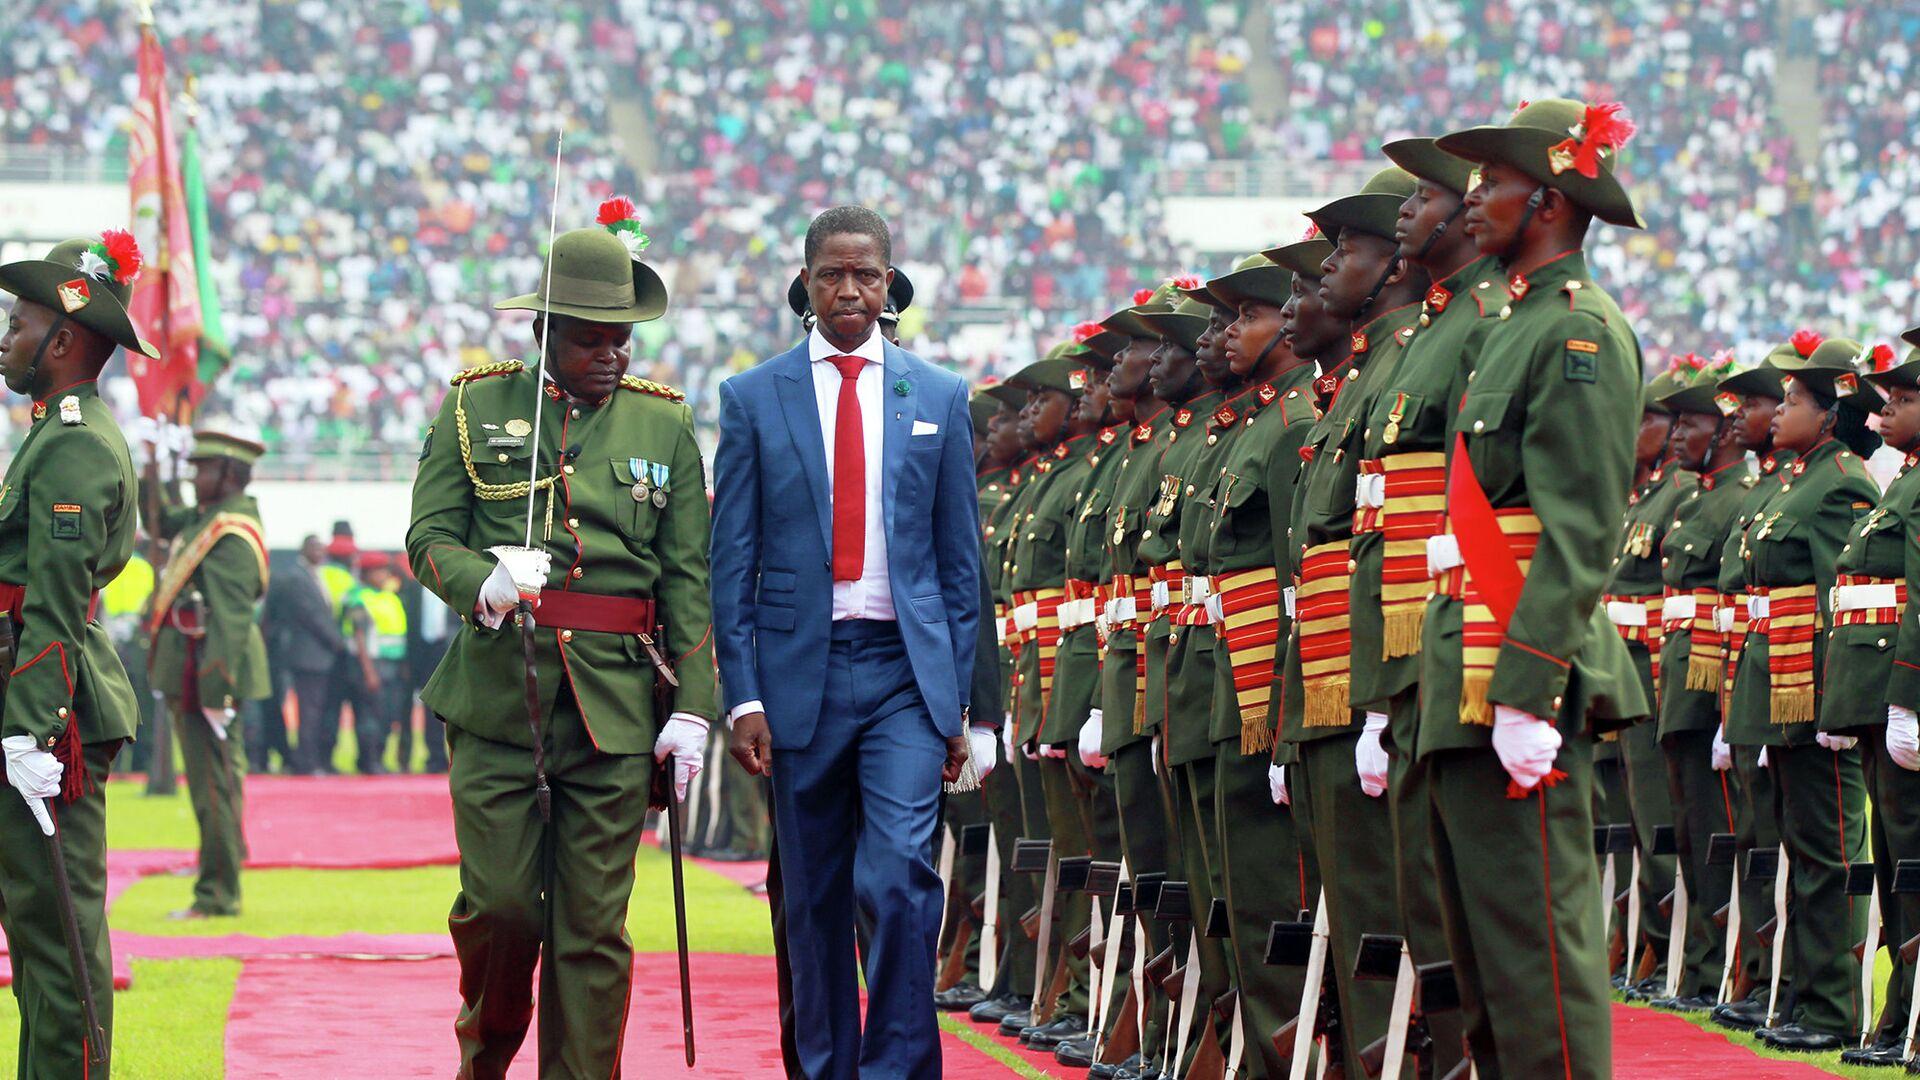 Президент Замбии Эдгар Лунгу. Январь 2015 год - РИА Новости, 1920, 14.06.2021